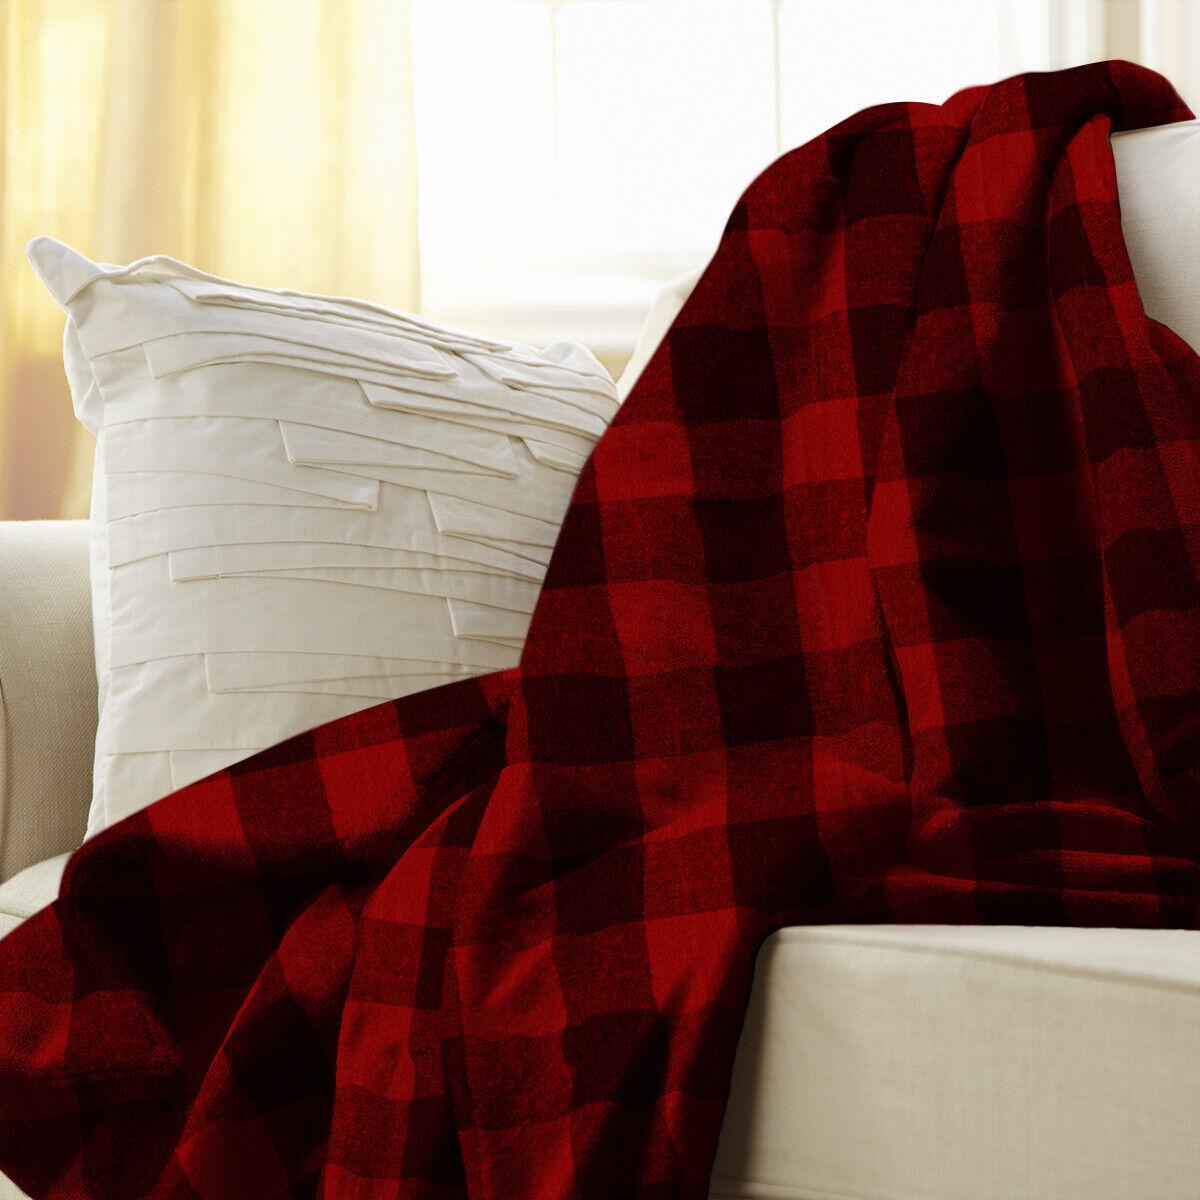 Sunbeam Heated Electric Microplush Throw Blanket with 3 heat